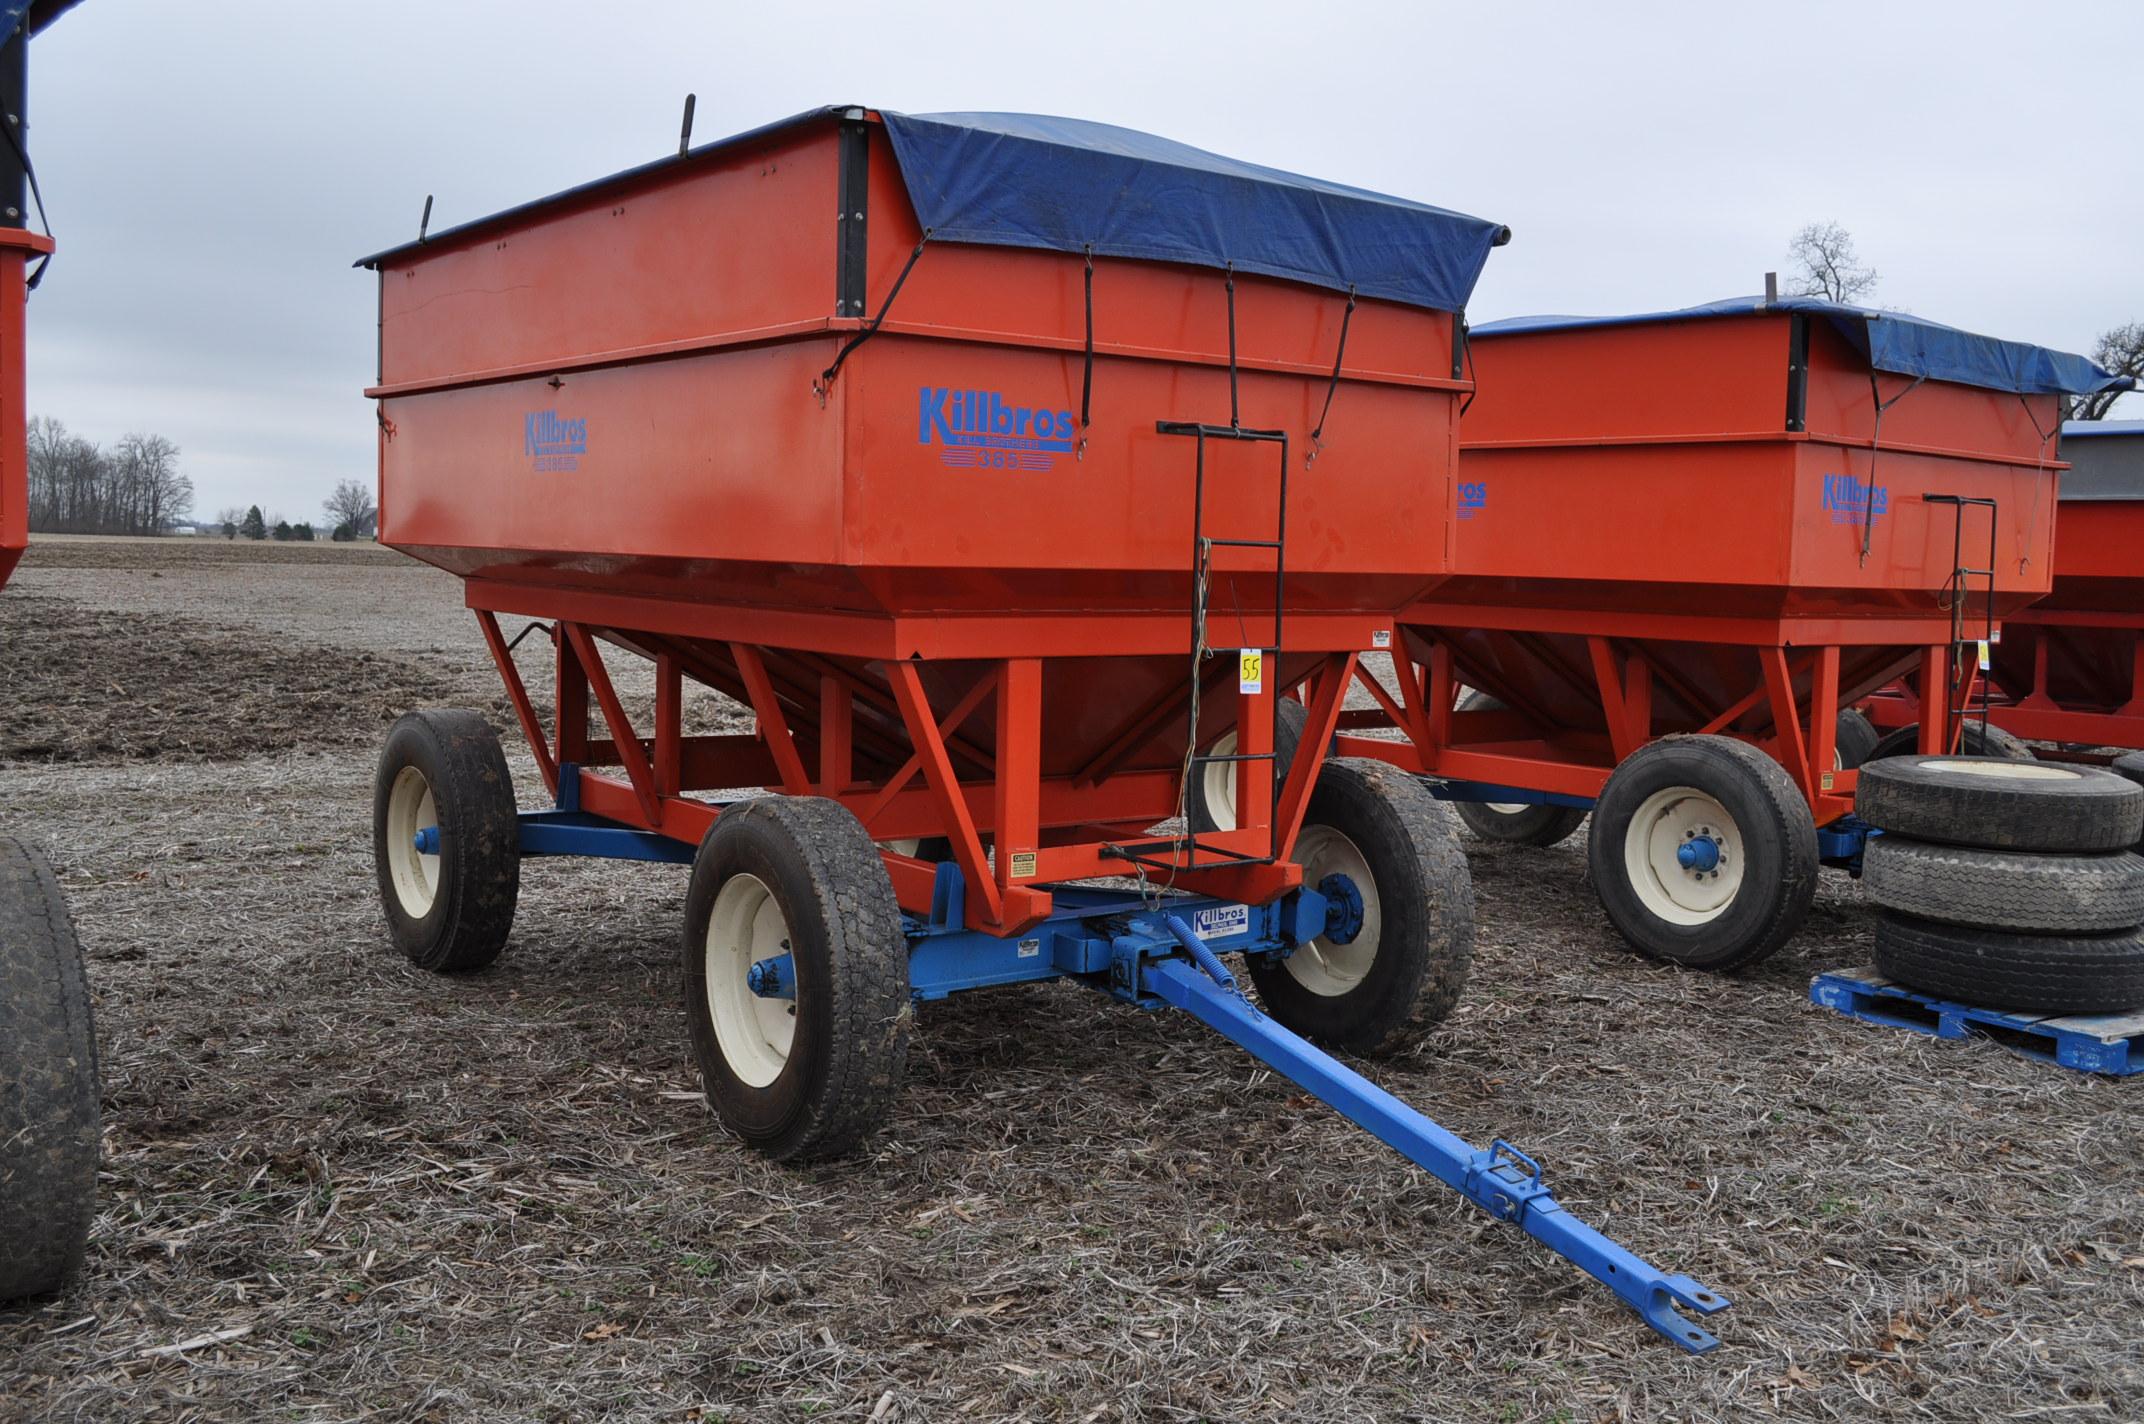 Killbros 385 gravity bed wagon, tarp, steel rails, Killbros 1386 gear, 11 R 22.5 tires - Image 4 of 7